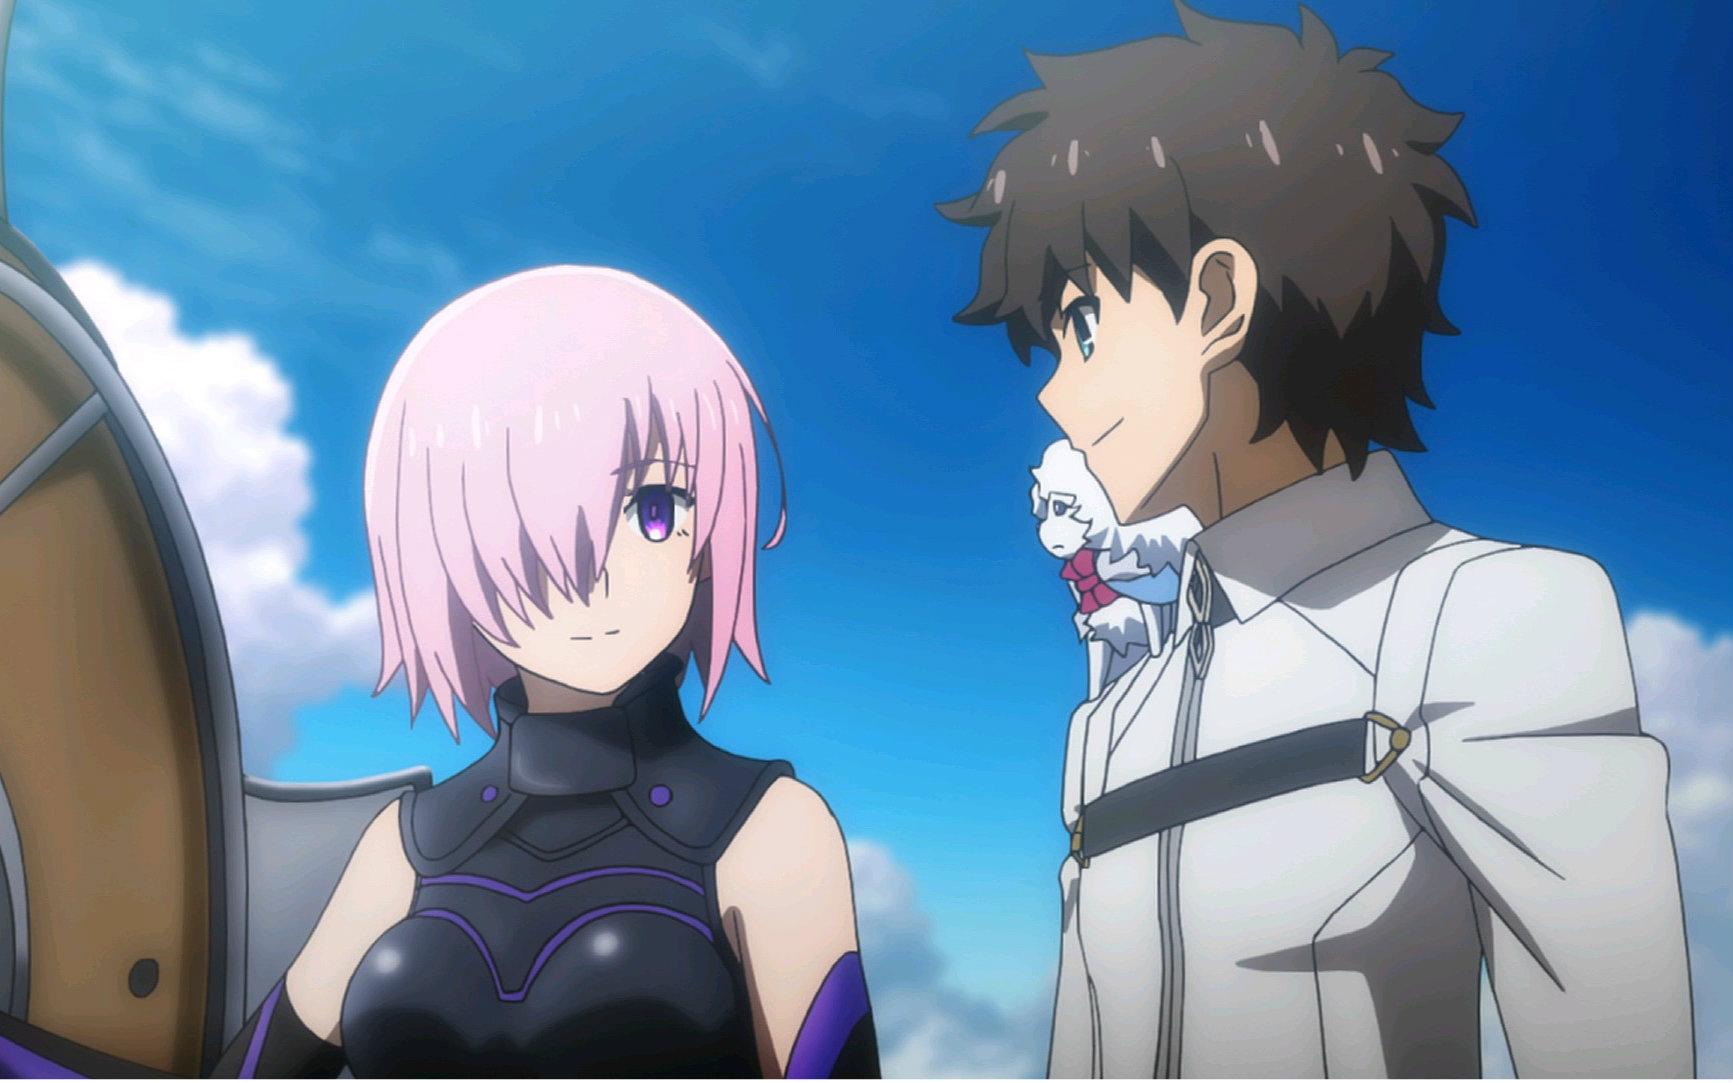 【特别篇】Fate/Grand Order -First Order-【独家正版】